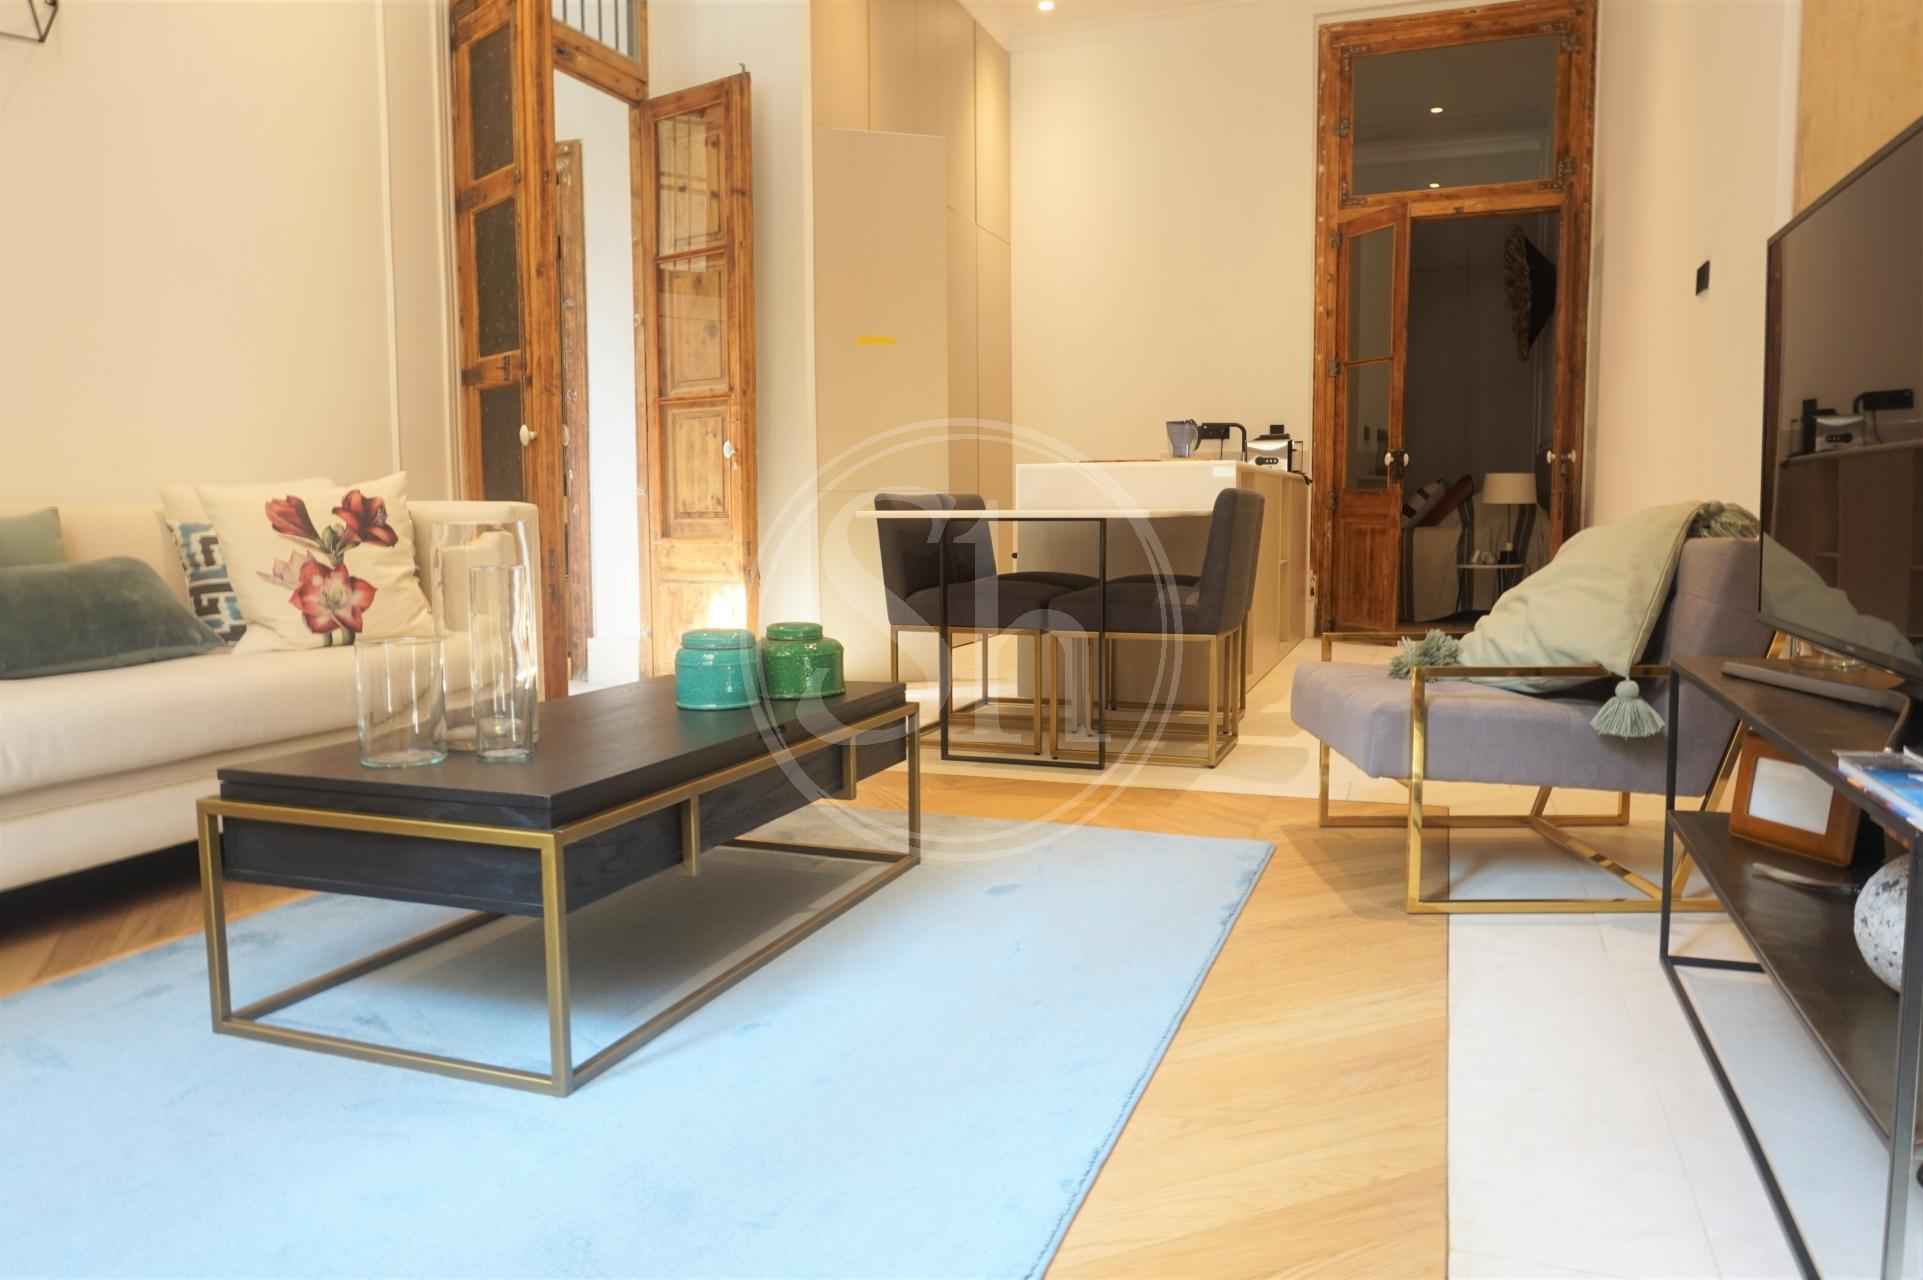 Wohnung zur Miete in Barcelona Trafalgar - Lluis Companys